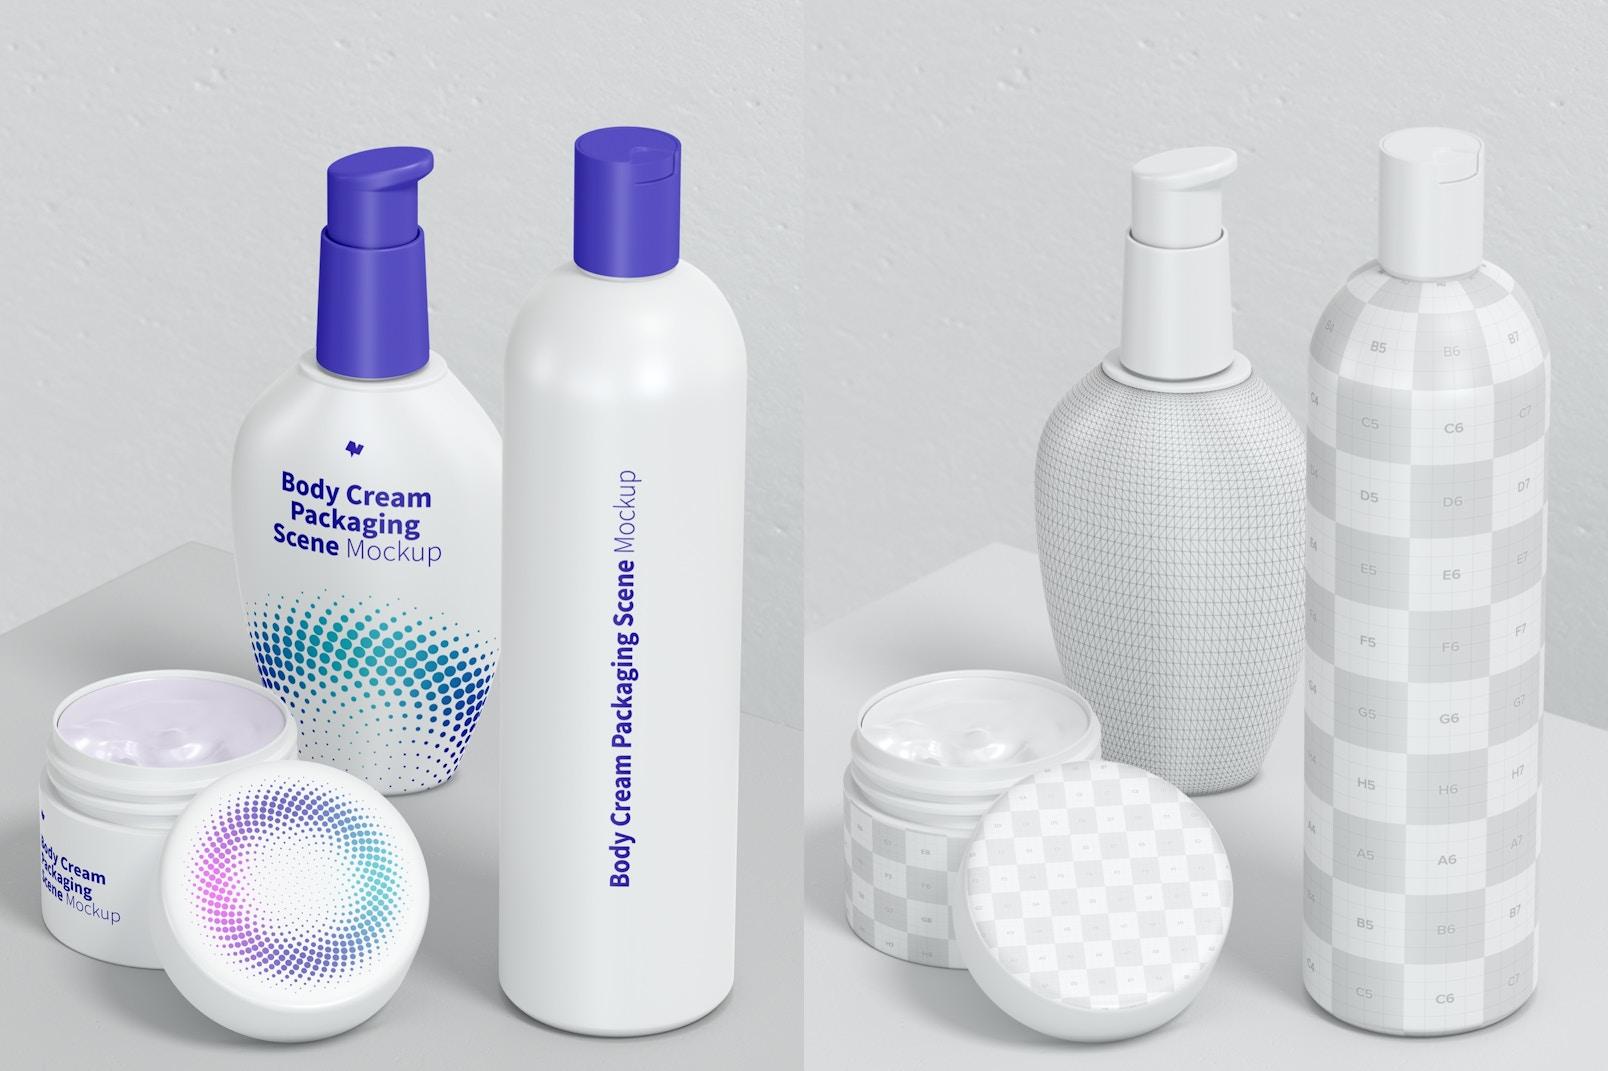 Body Cream Packaging Scene Mockup 02